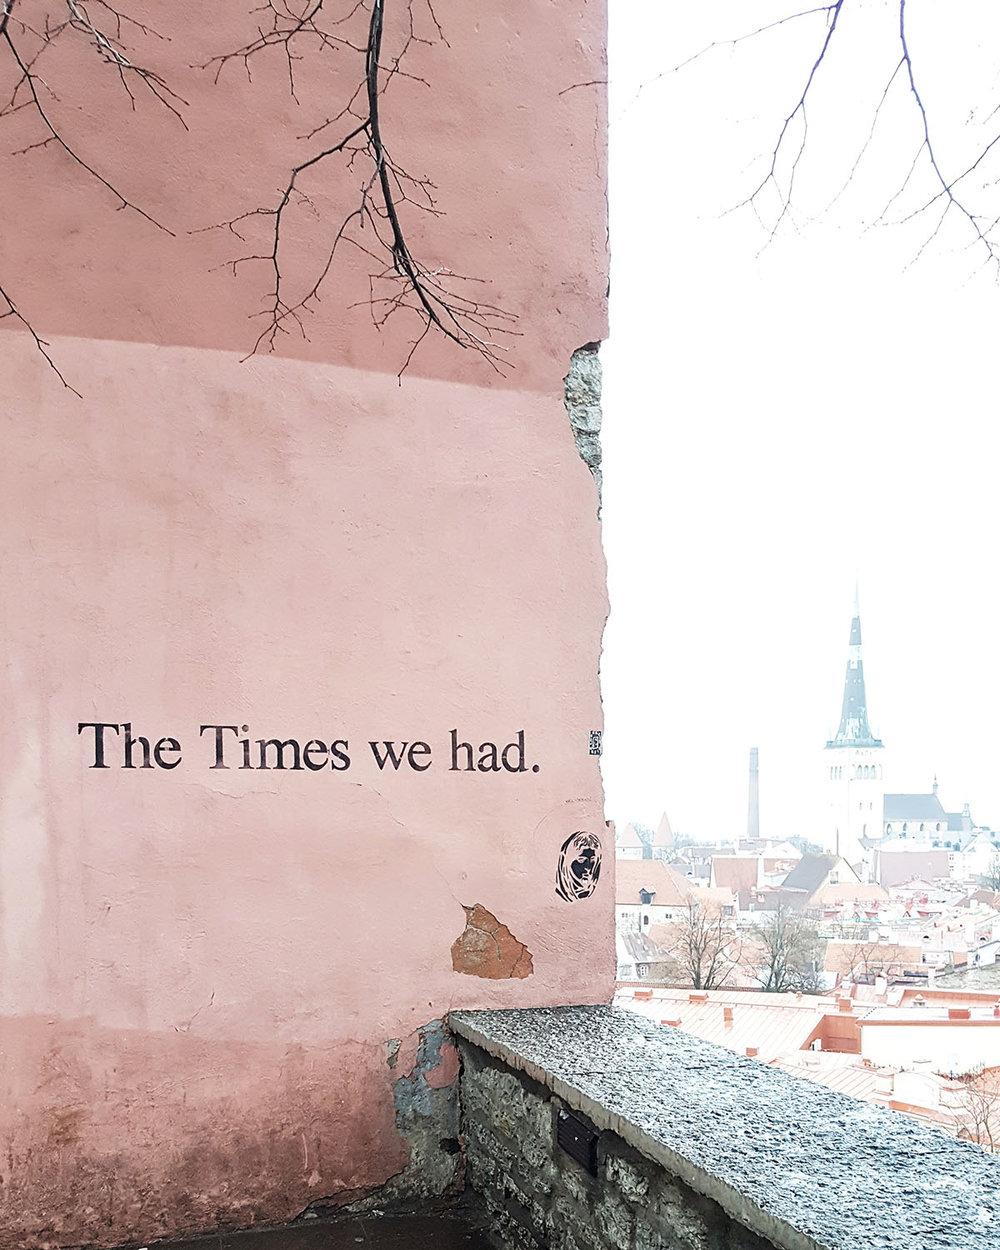 timeswehad.jpg